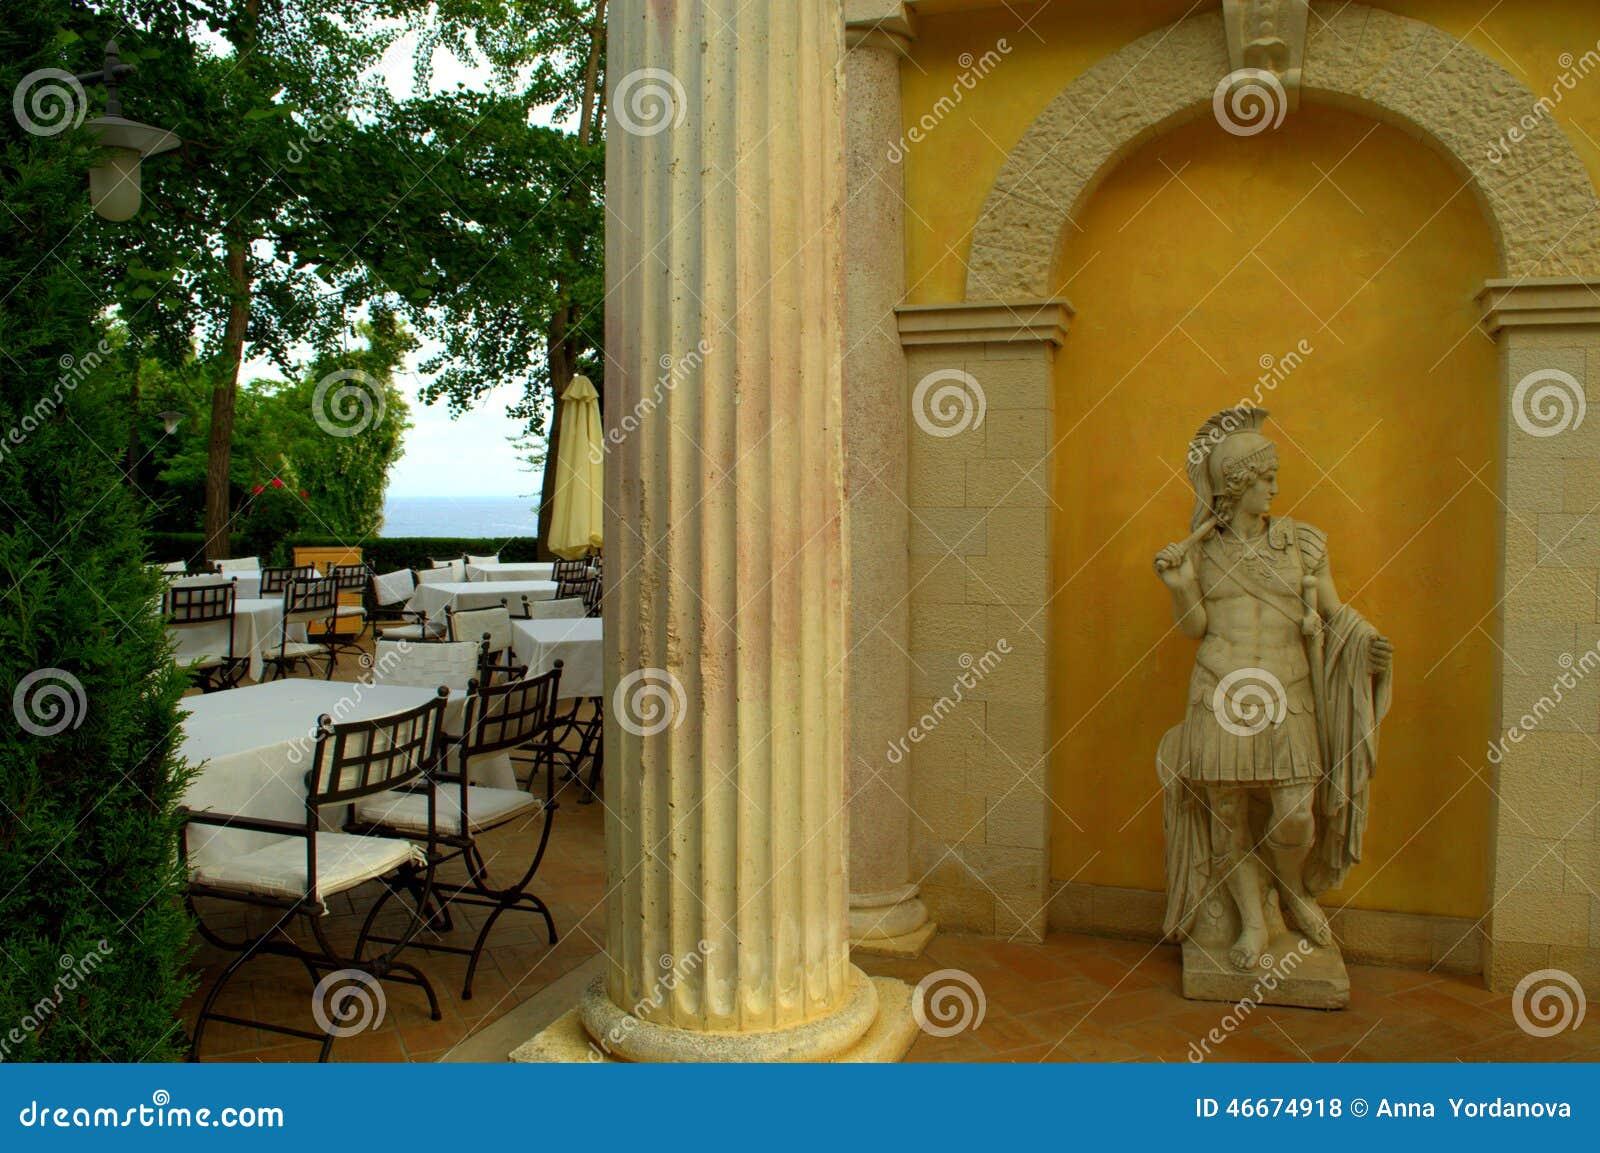 Outdoor restaurant statue decoration stock photo image